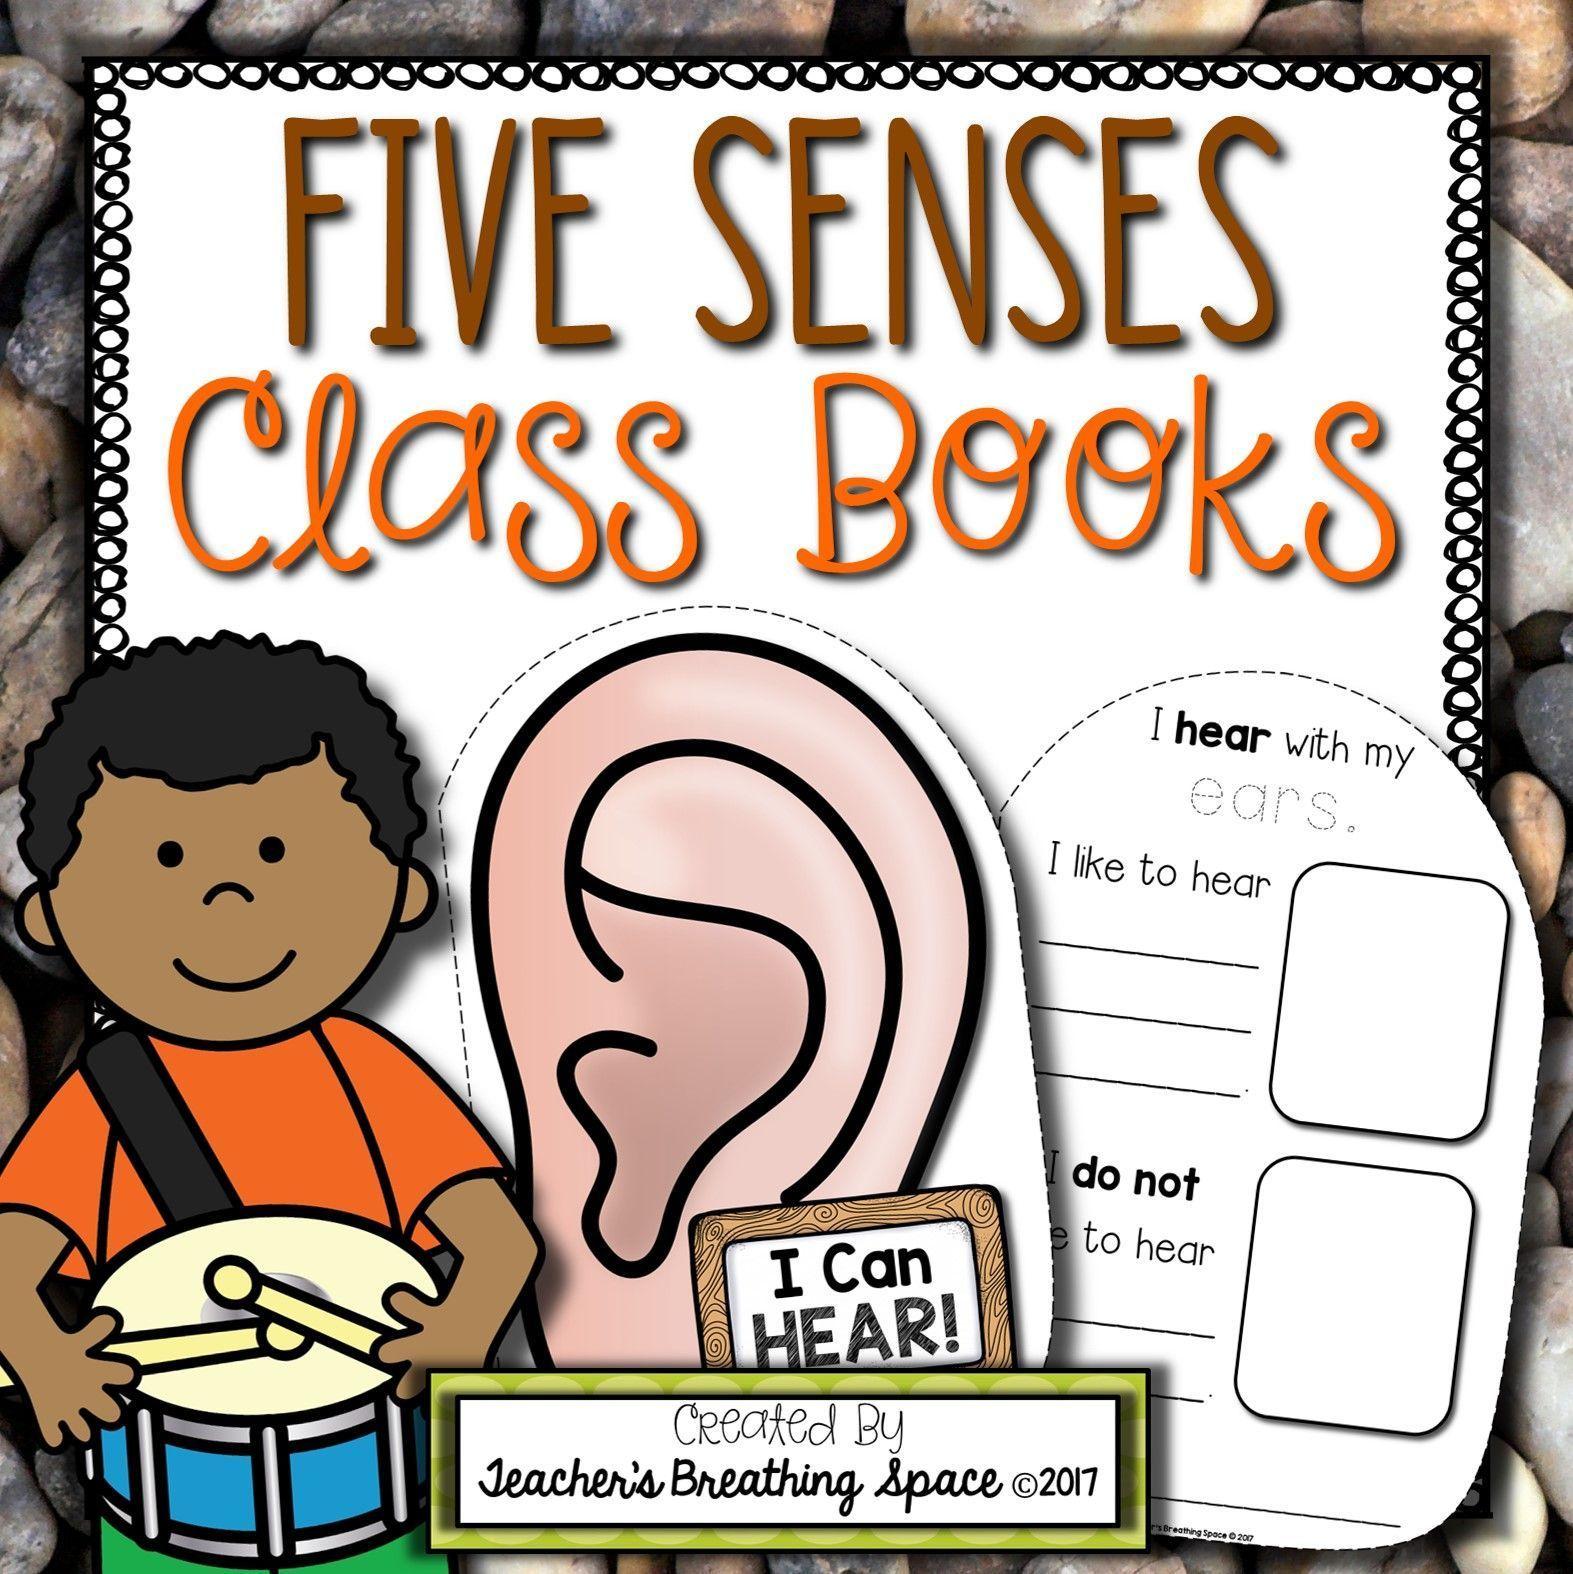 Five Senses Class Books Class Shape Books For Each Of